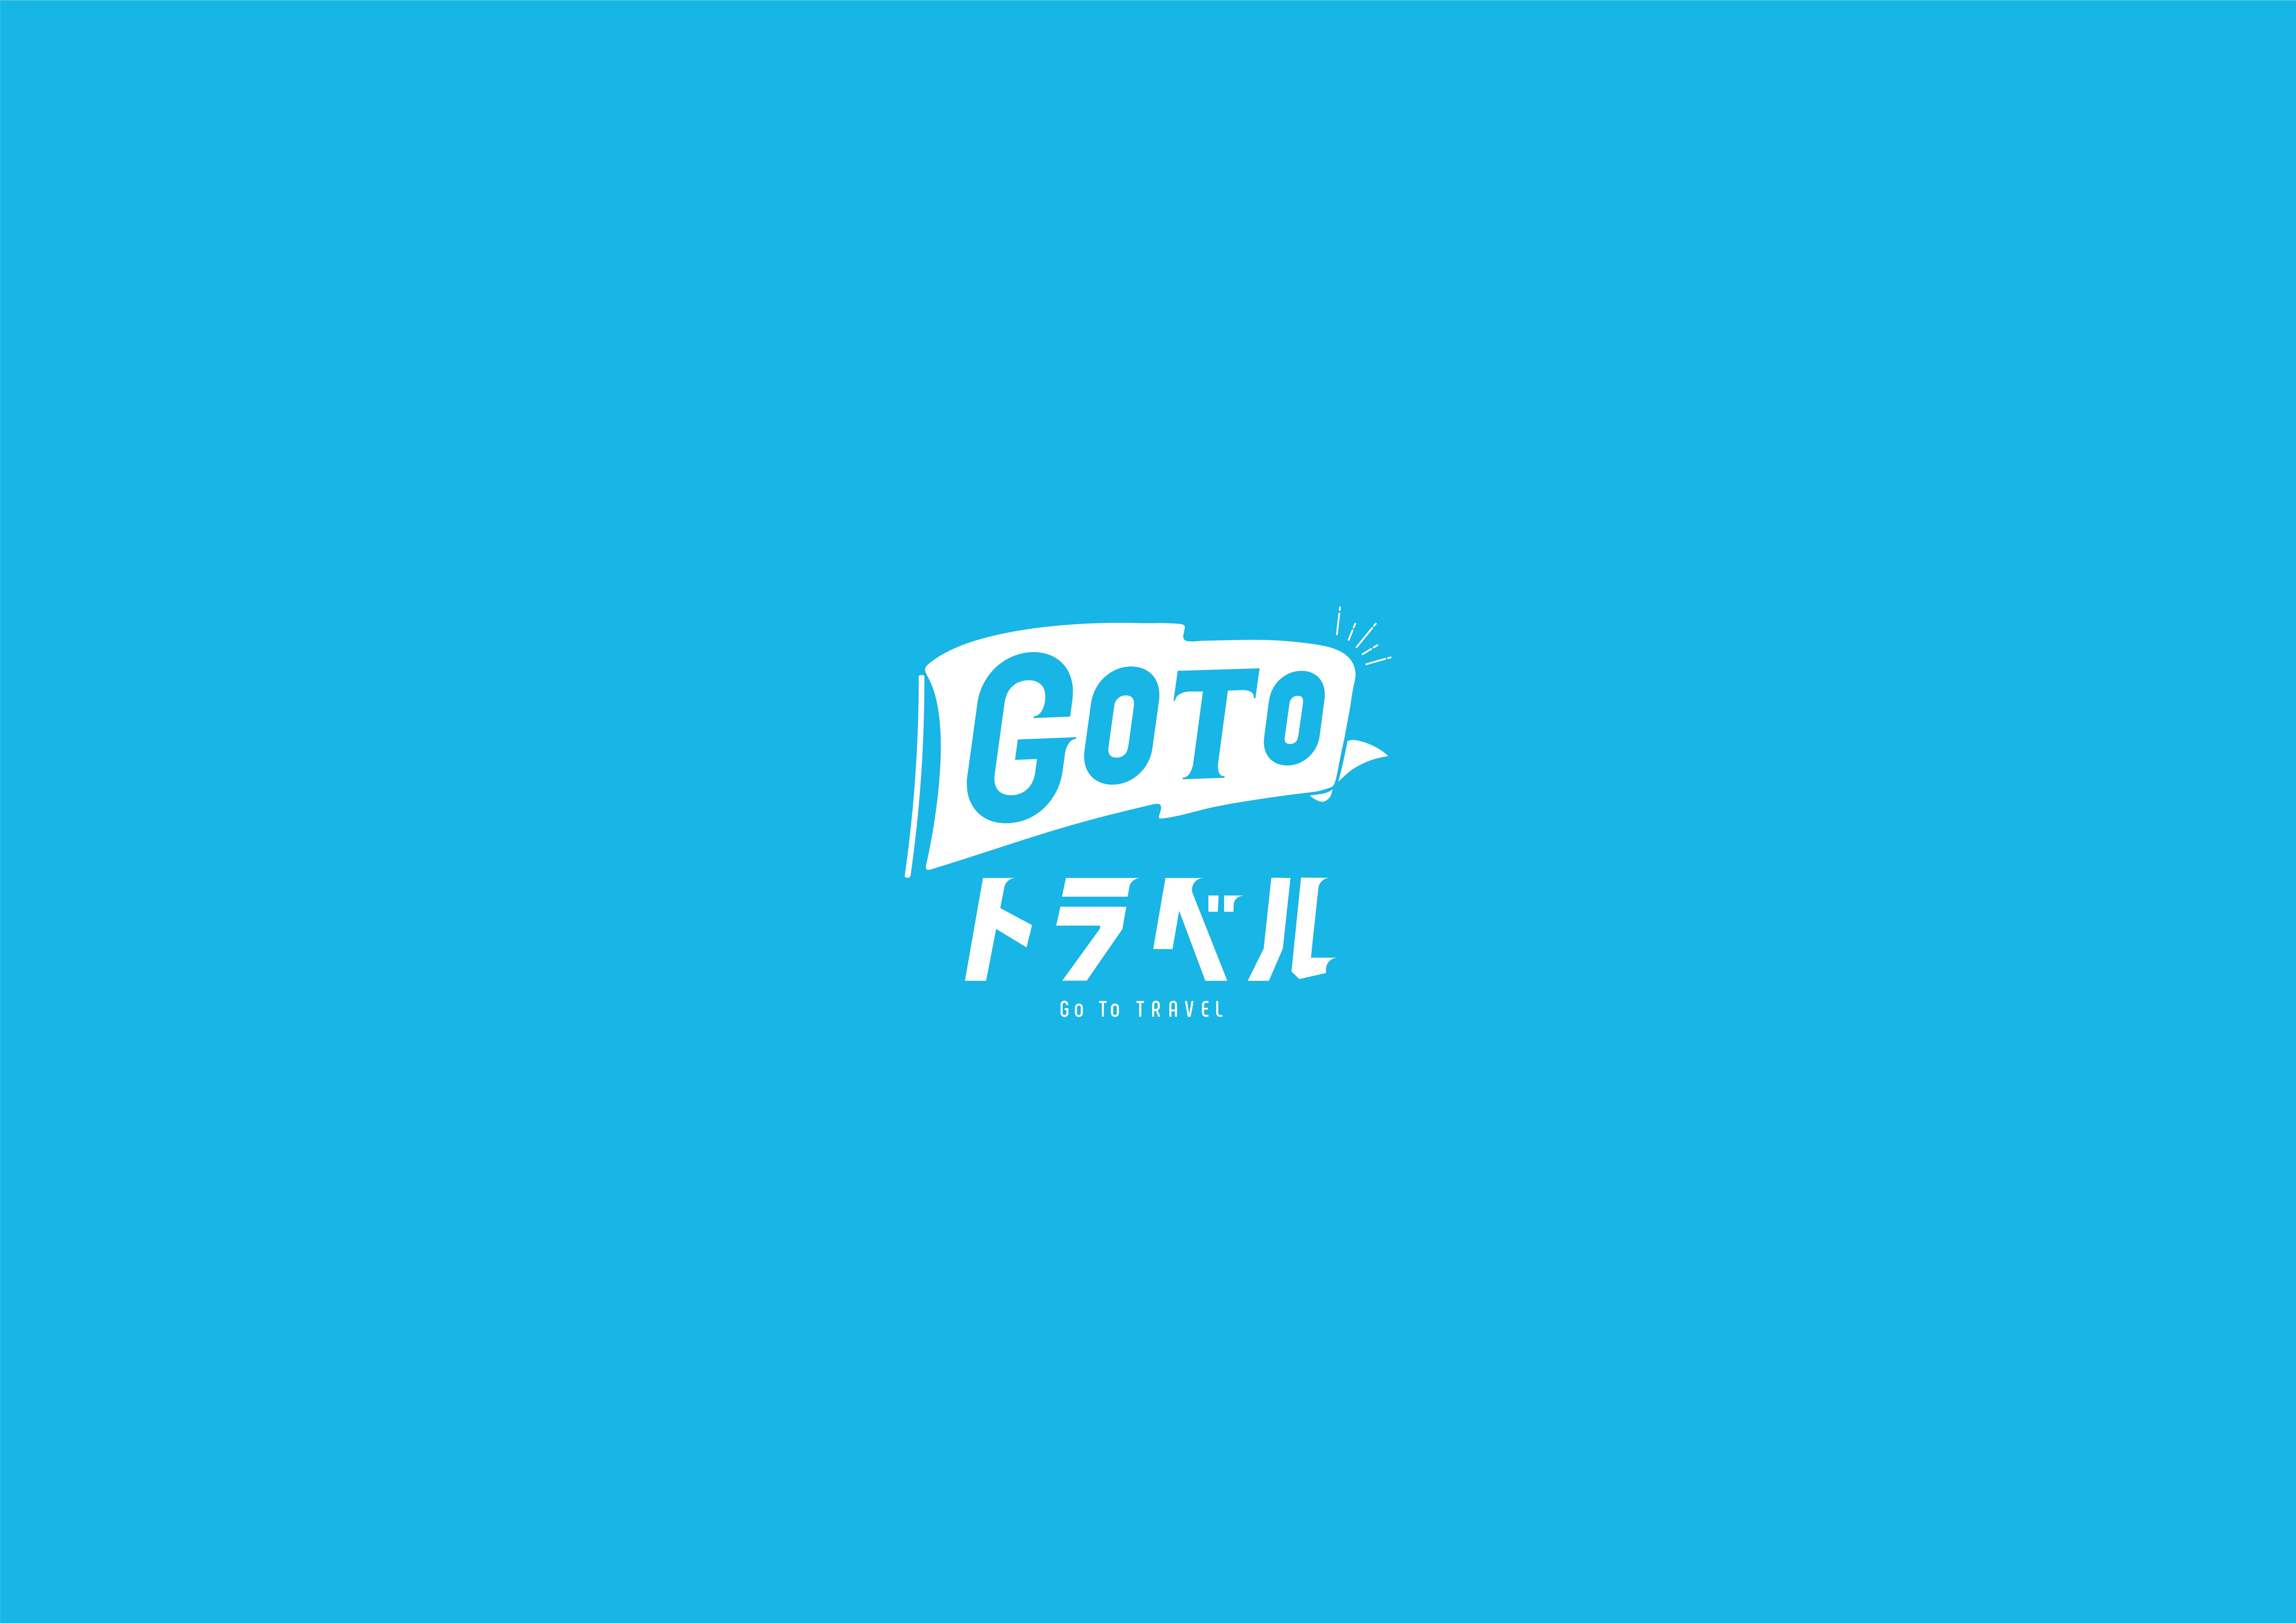 Gotoトラベル地域共通クーポン取扱店になります。